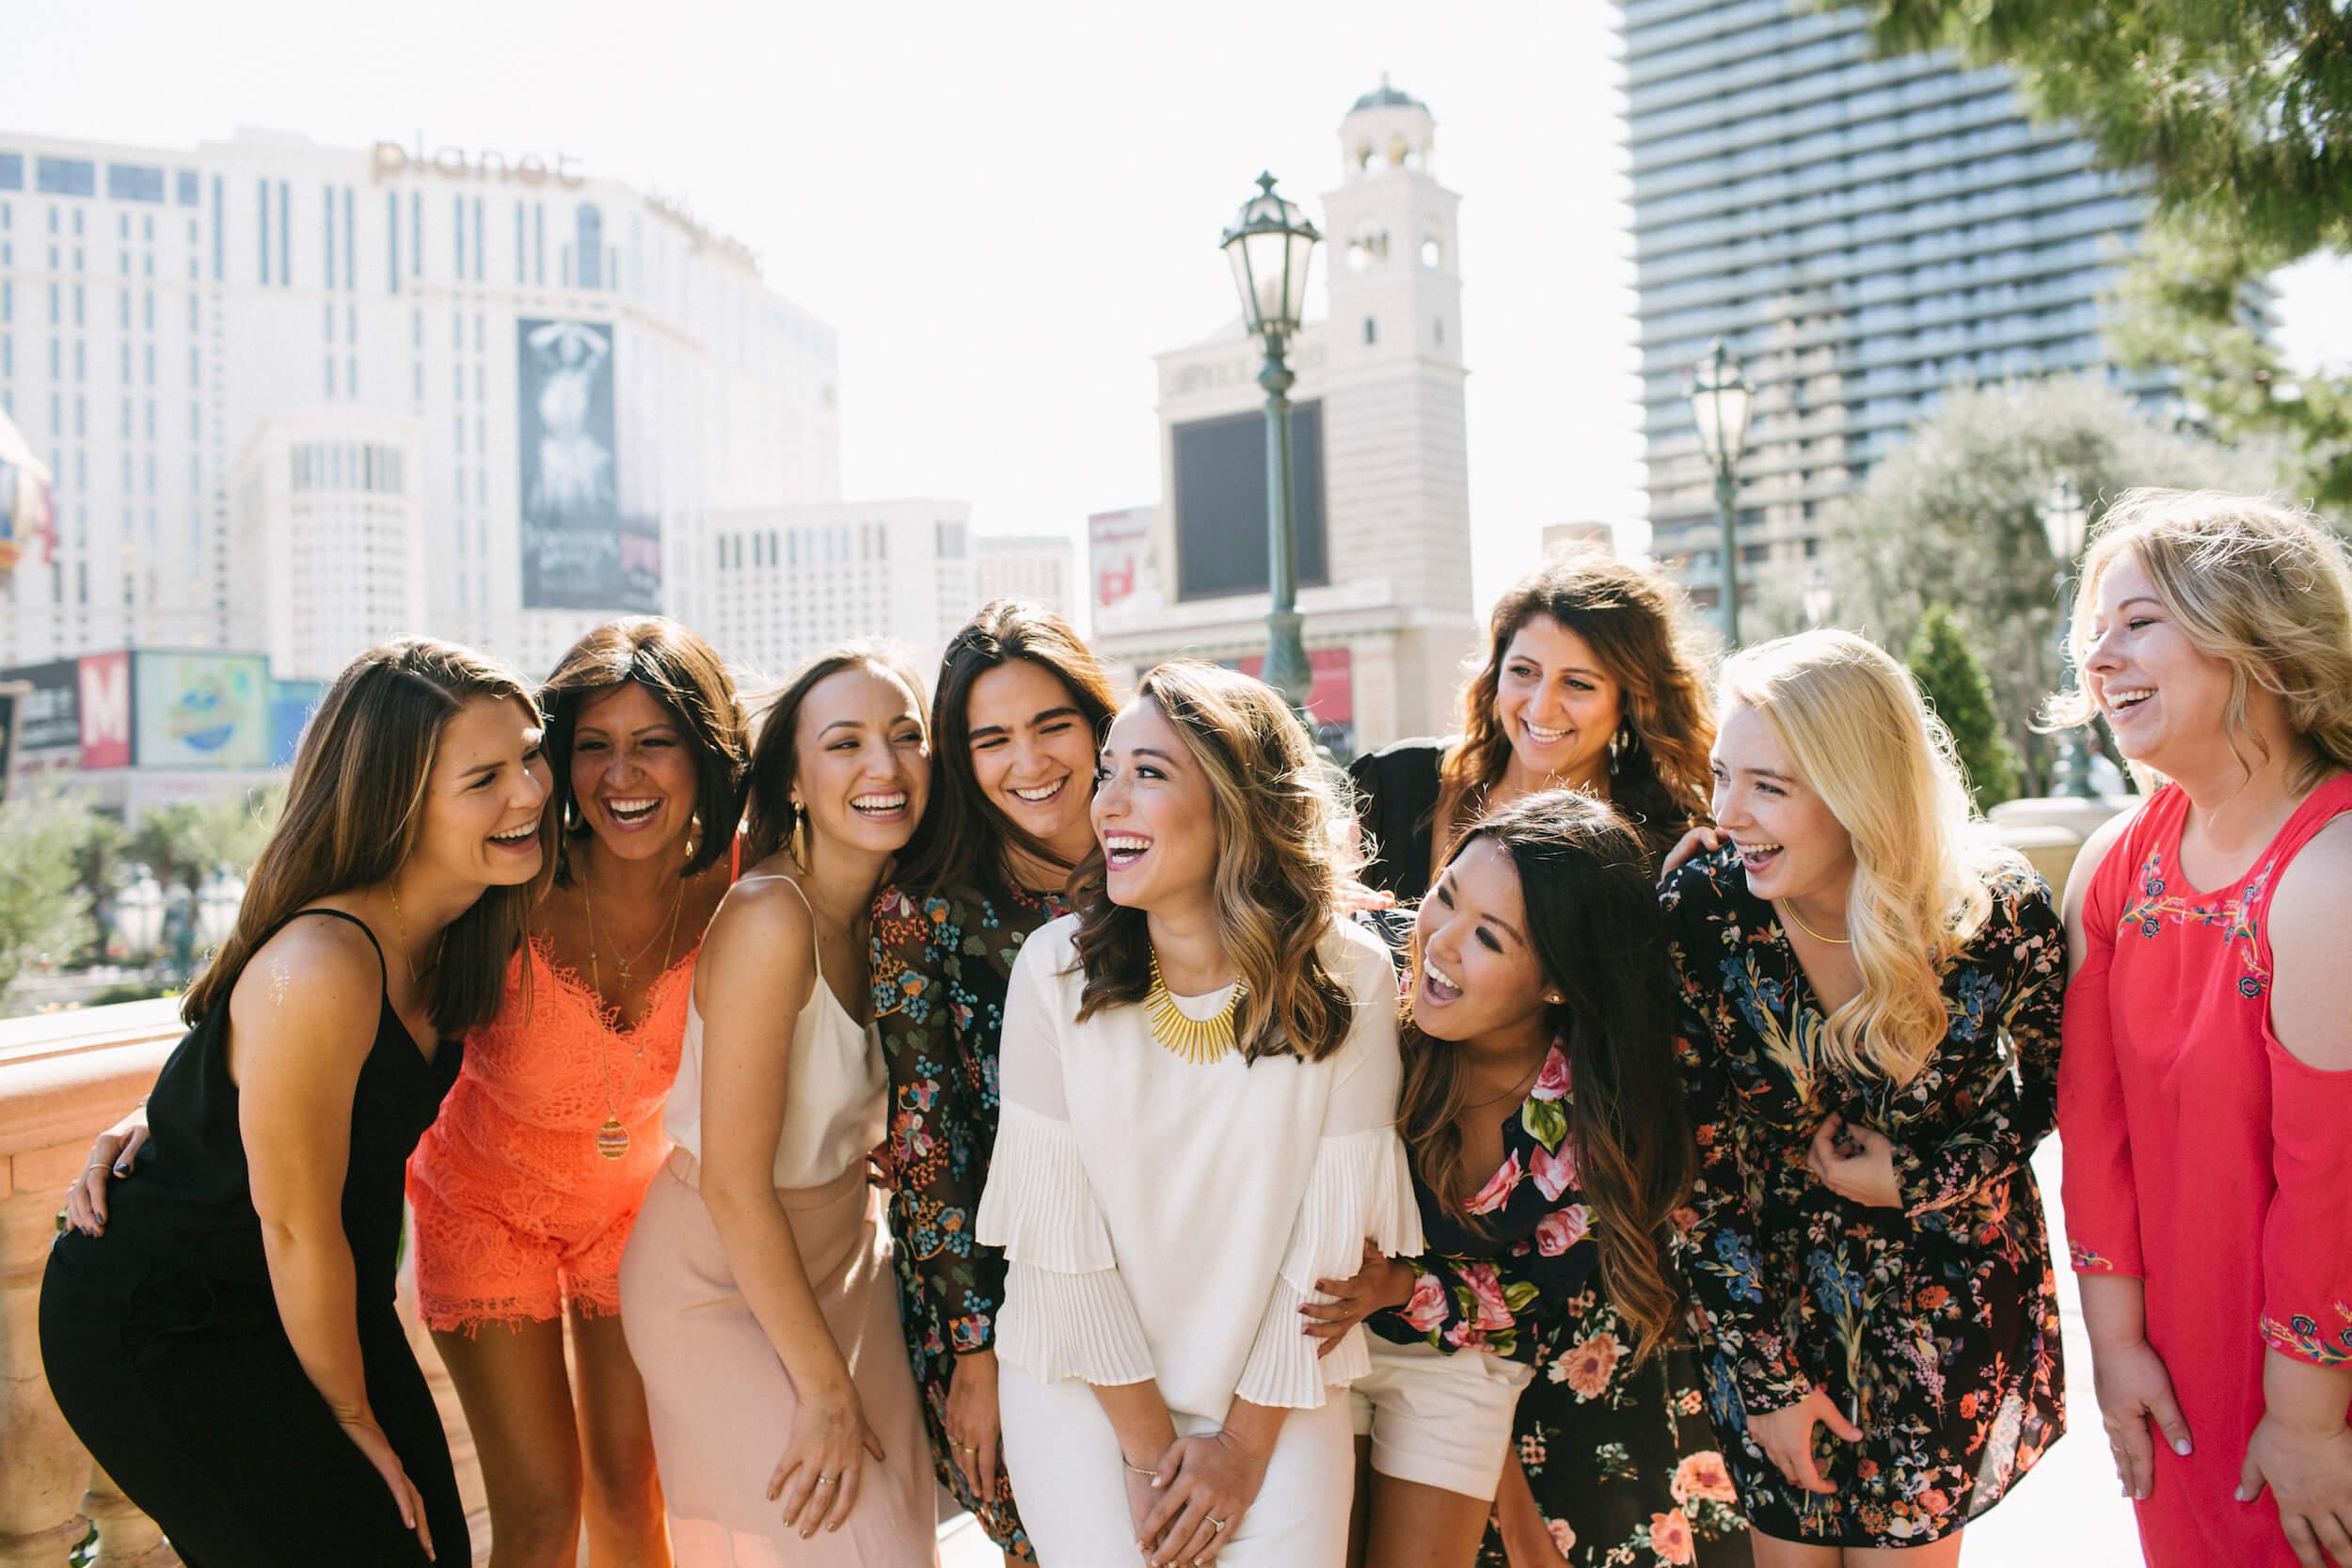 Bachelorettes in Vegas, Nevada